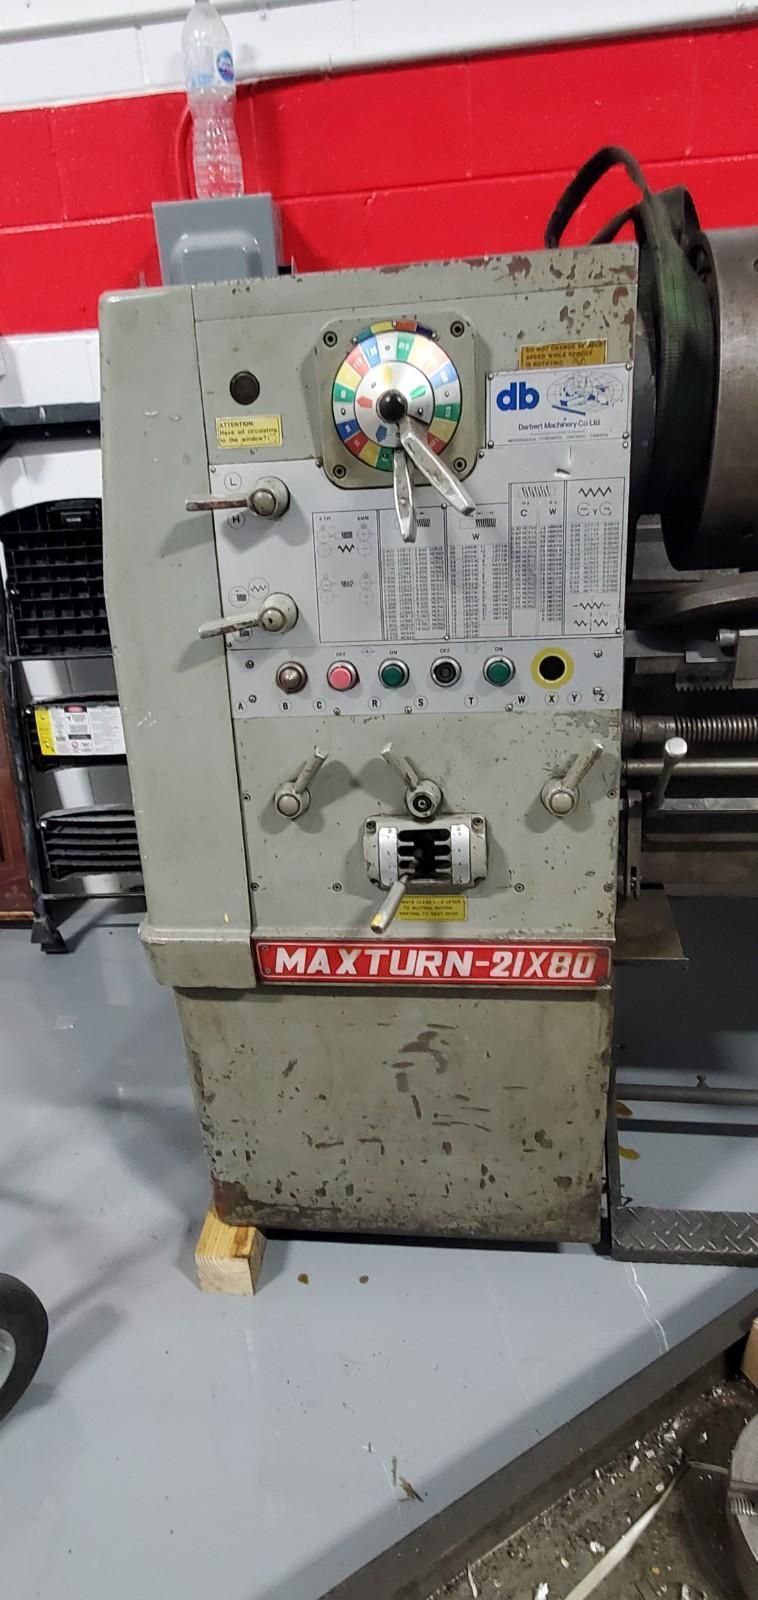 Colchester Maxturn 21x80 Manual Lathe